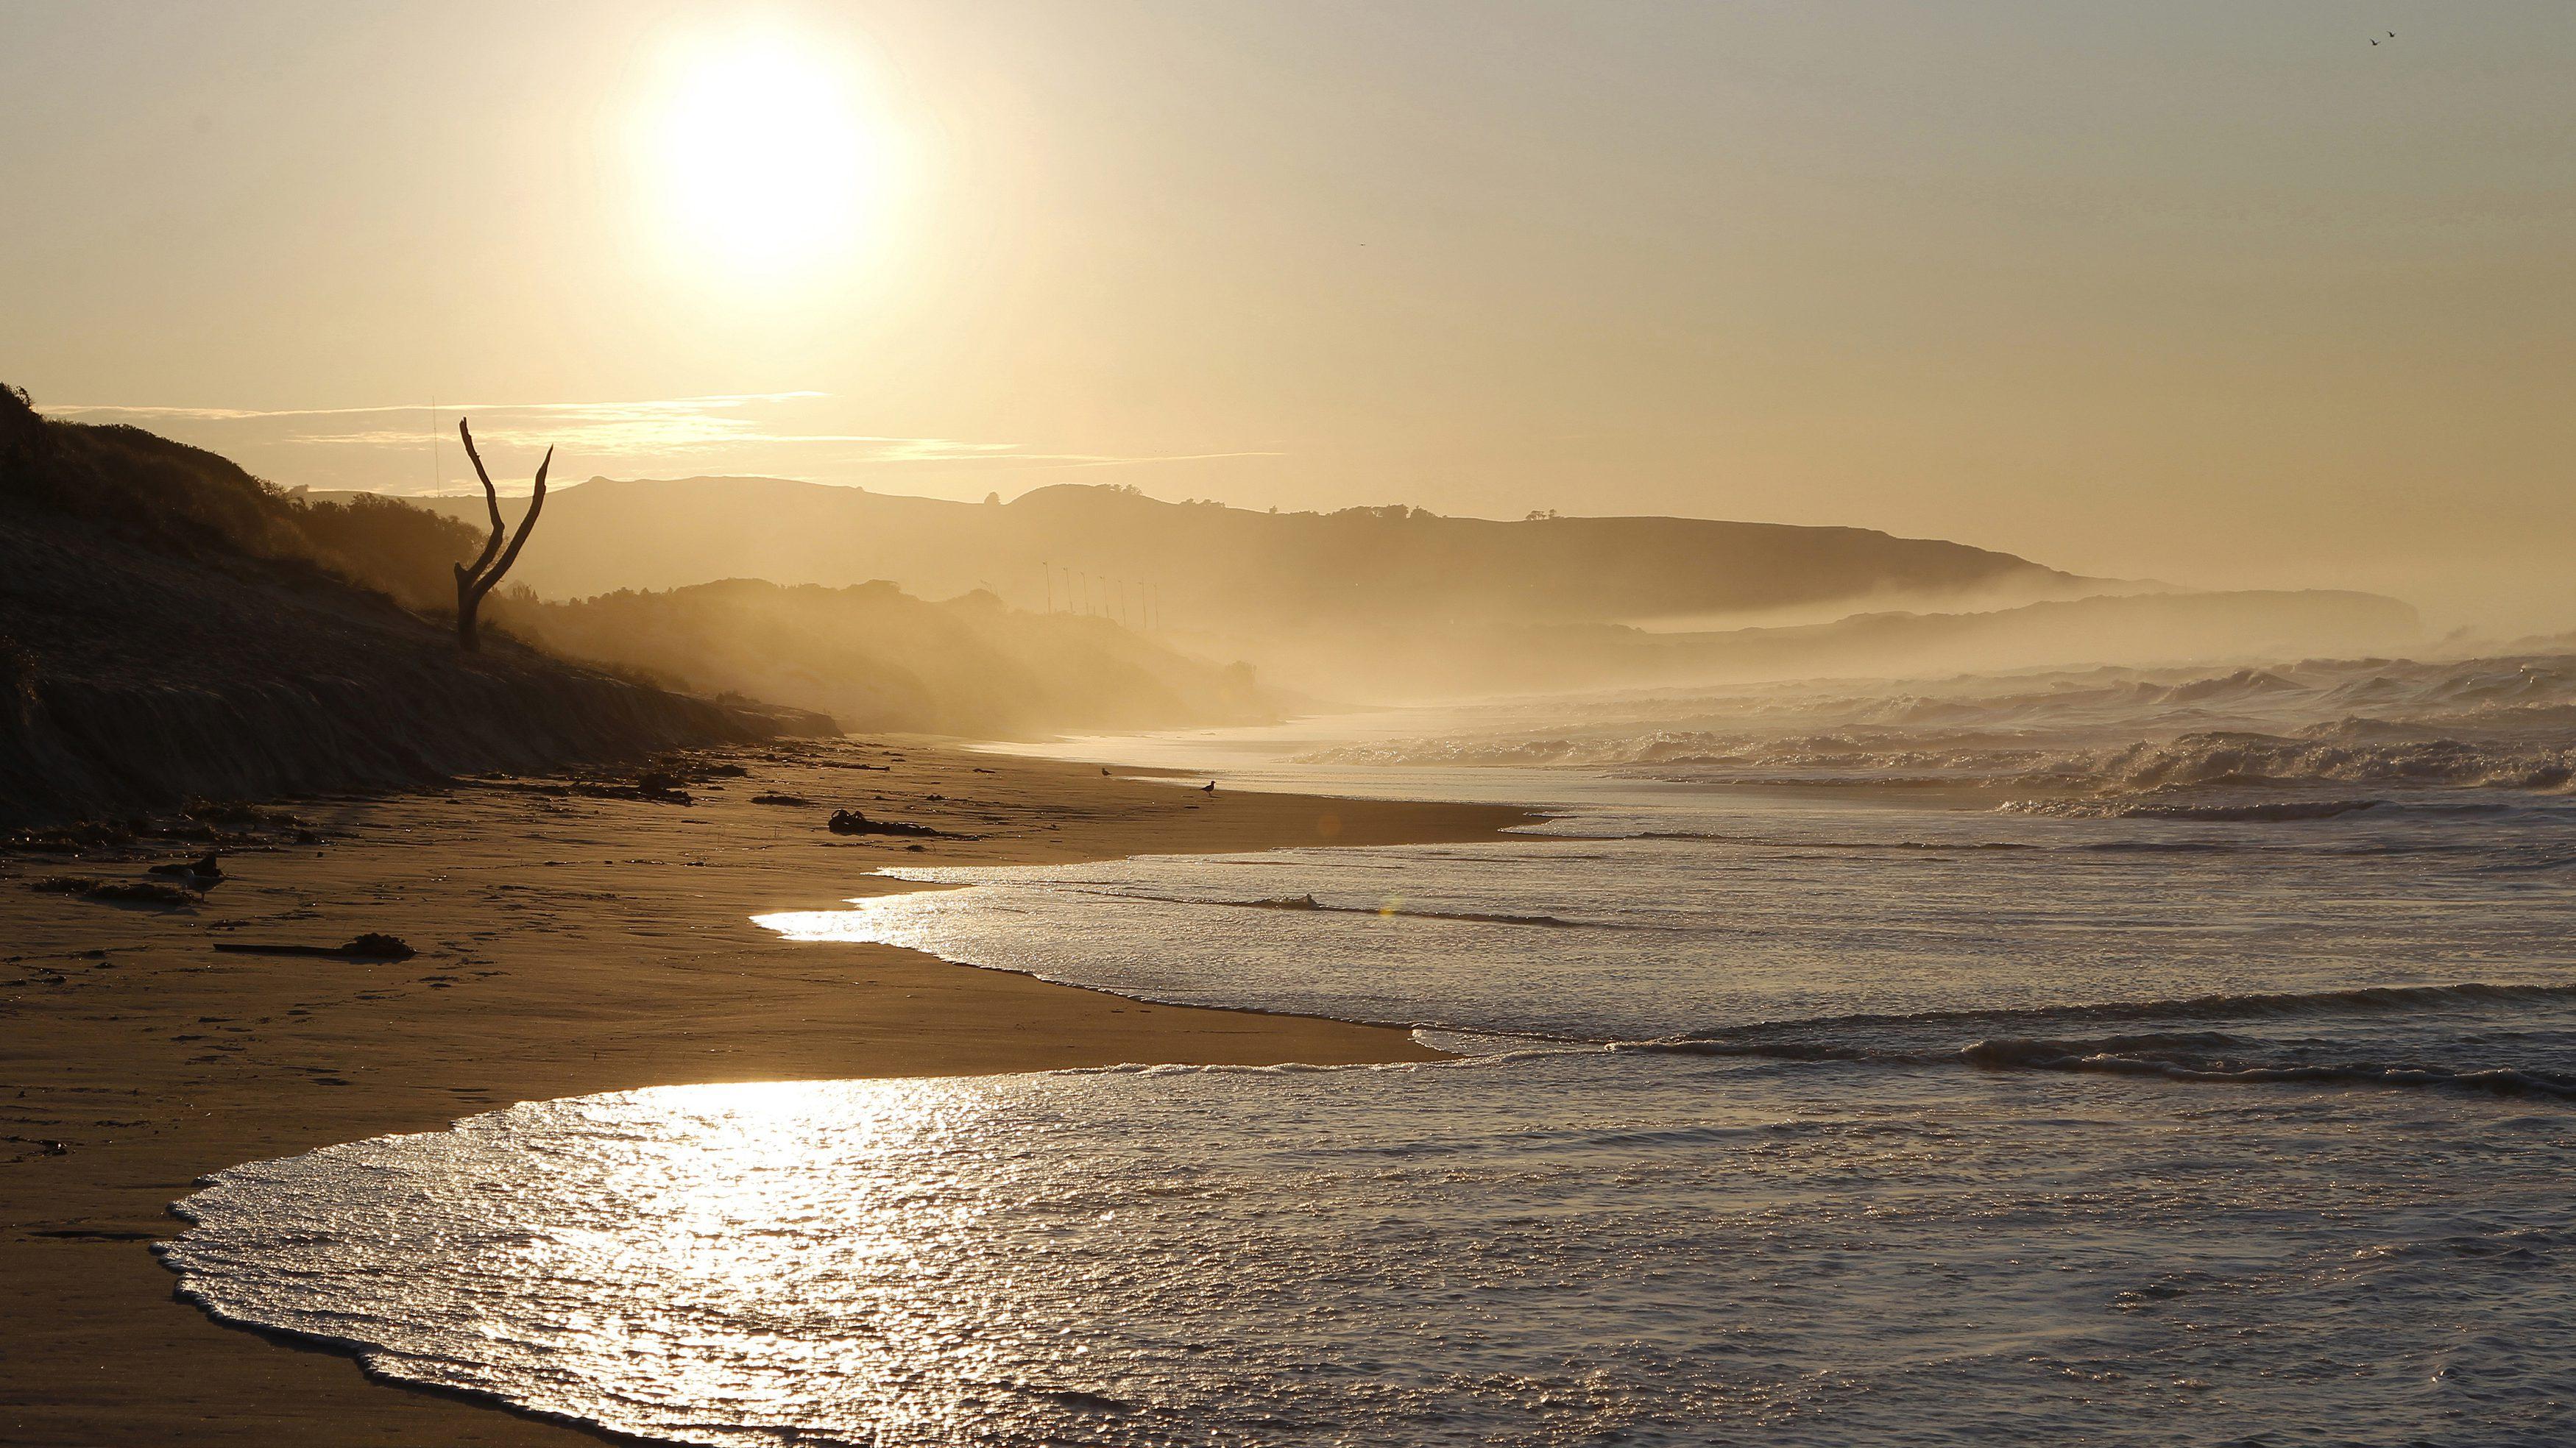 The sun rises over St. Clair beach in Dunedin